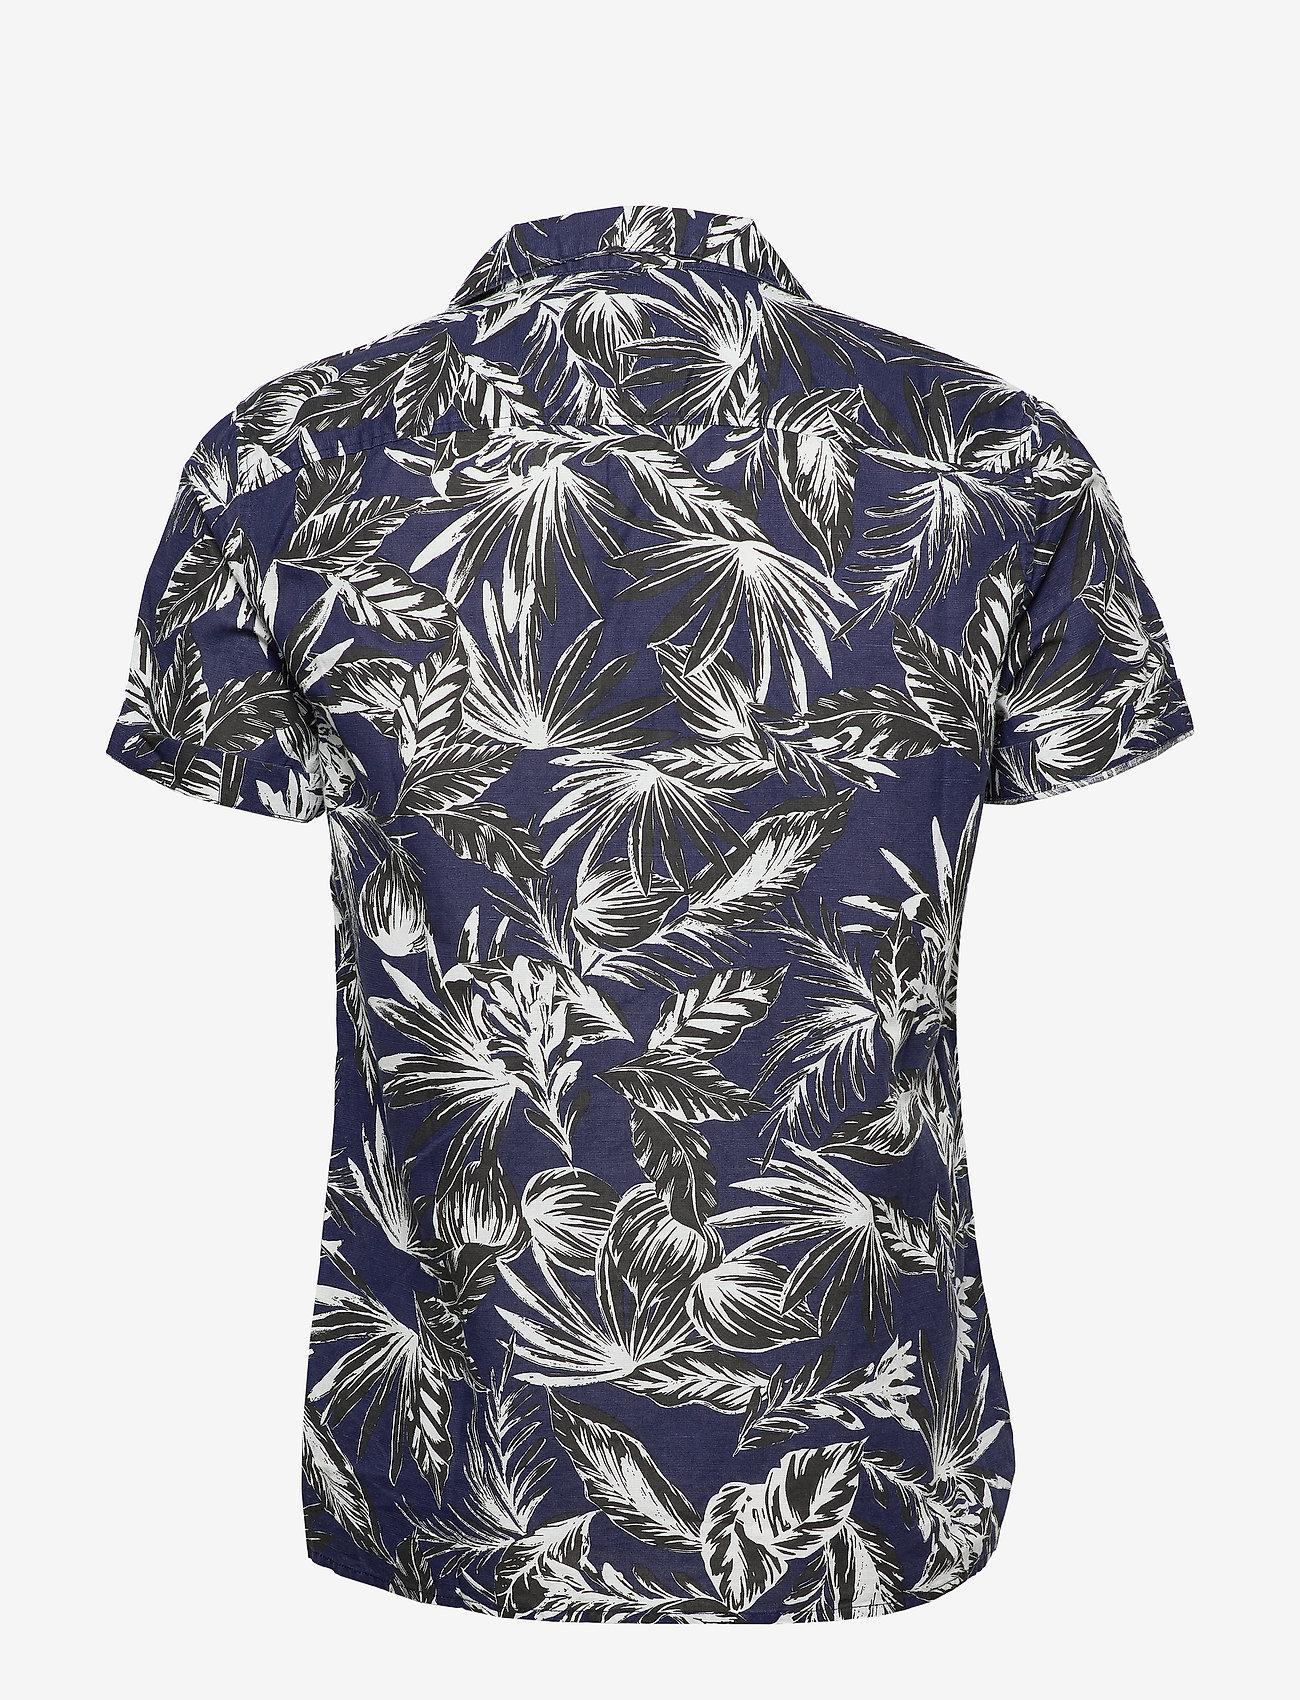 Edit Cabana S/s Shirt (Blue Palm) (699 kr) - Superdry